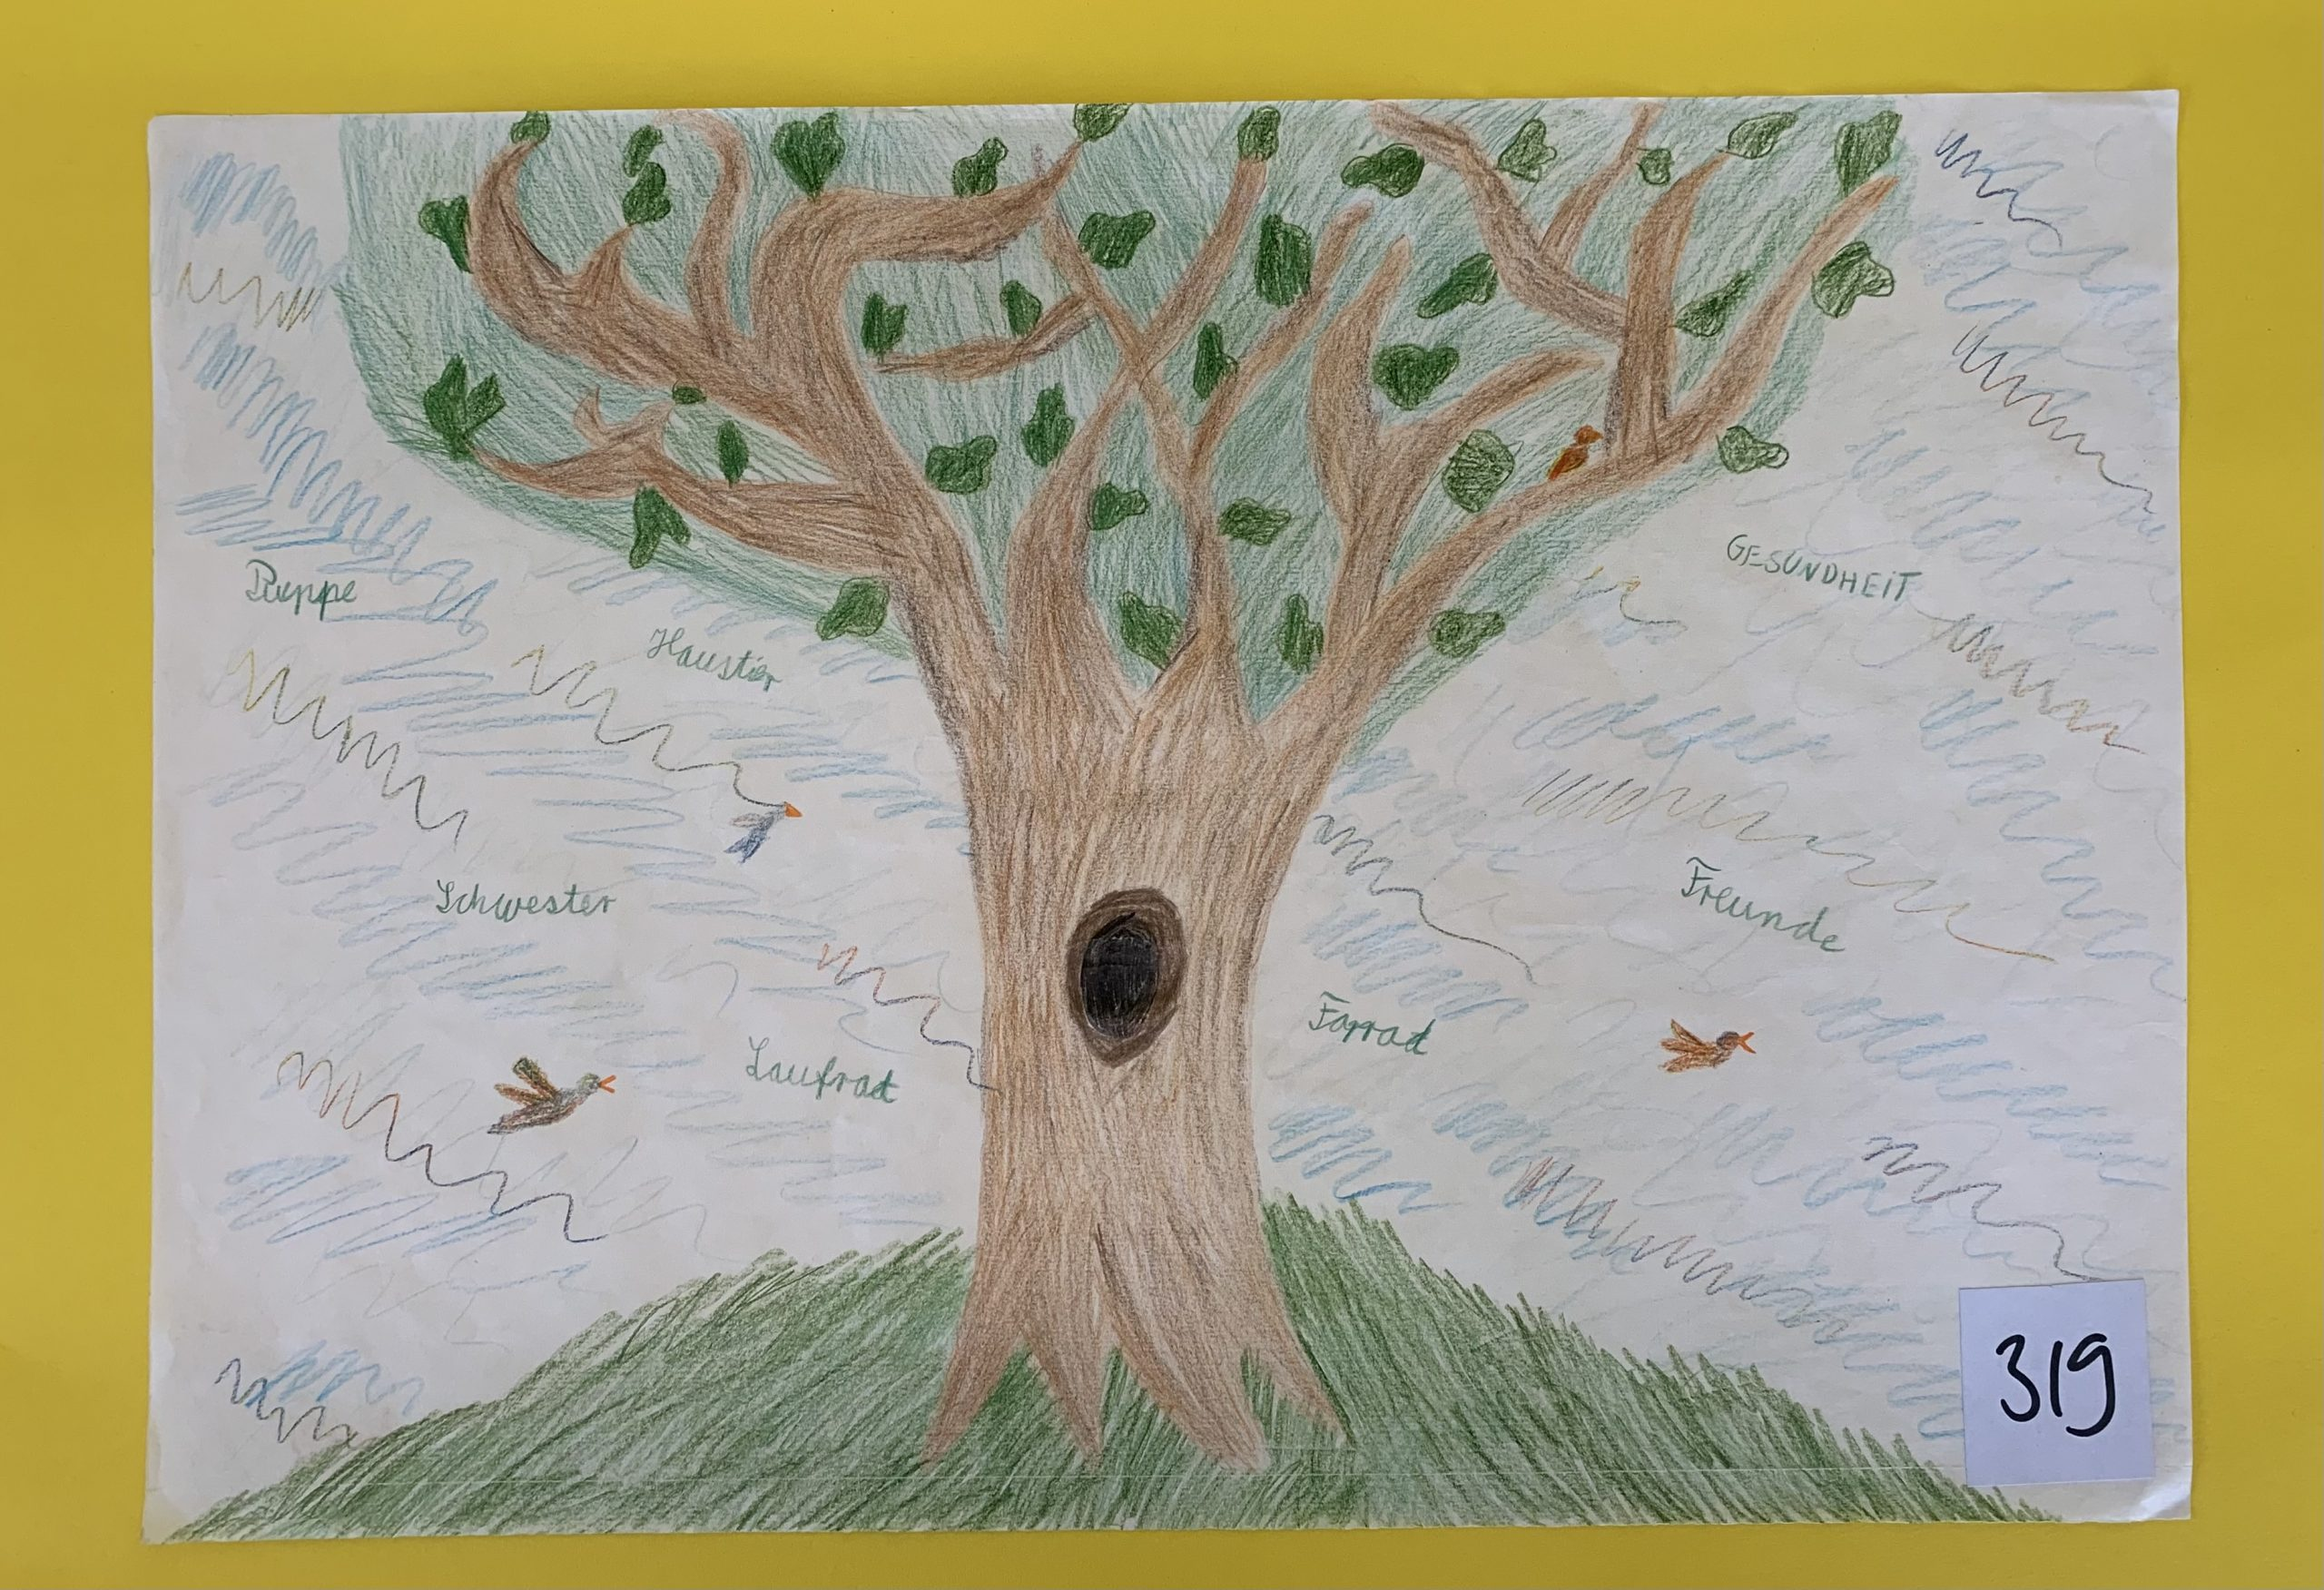 Malwettbewerb 2021 - Mühlbachhofschule